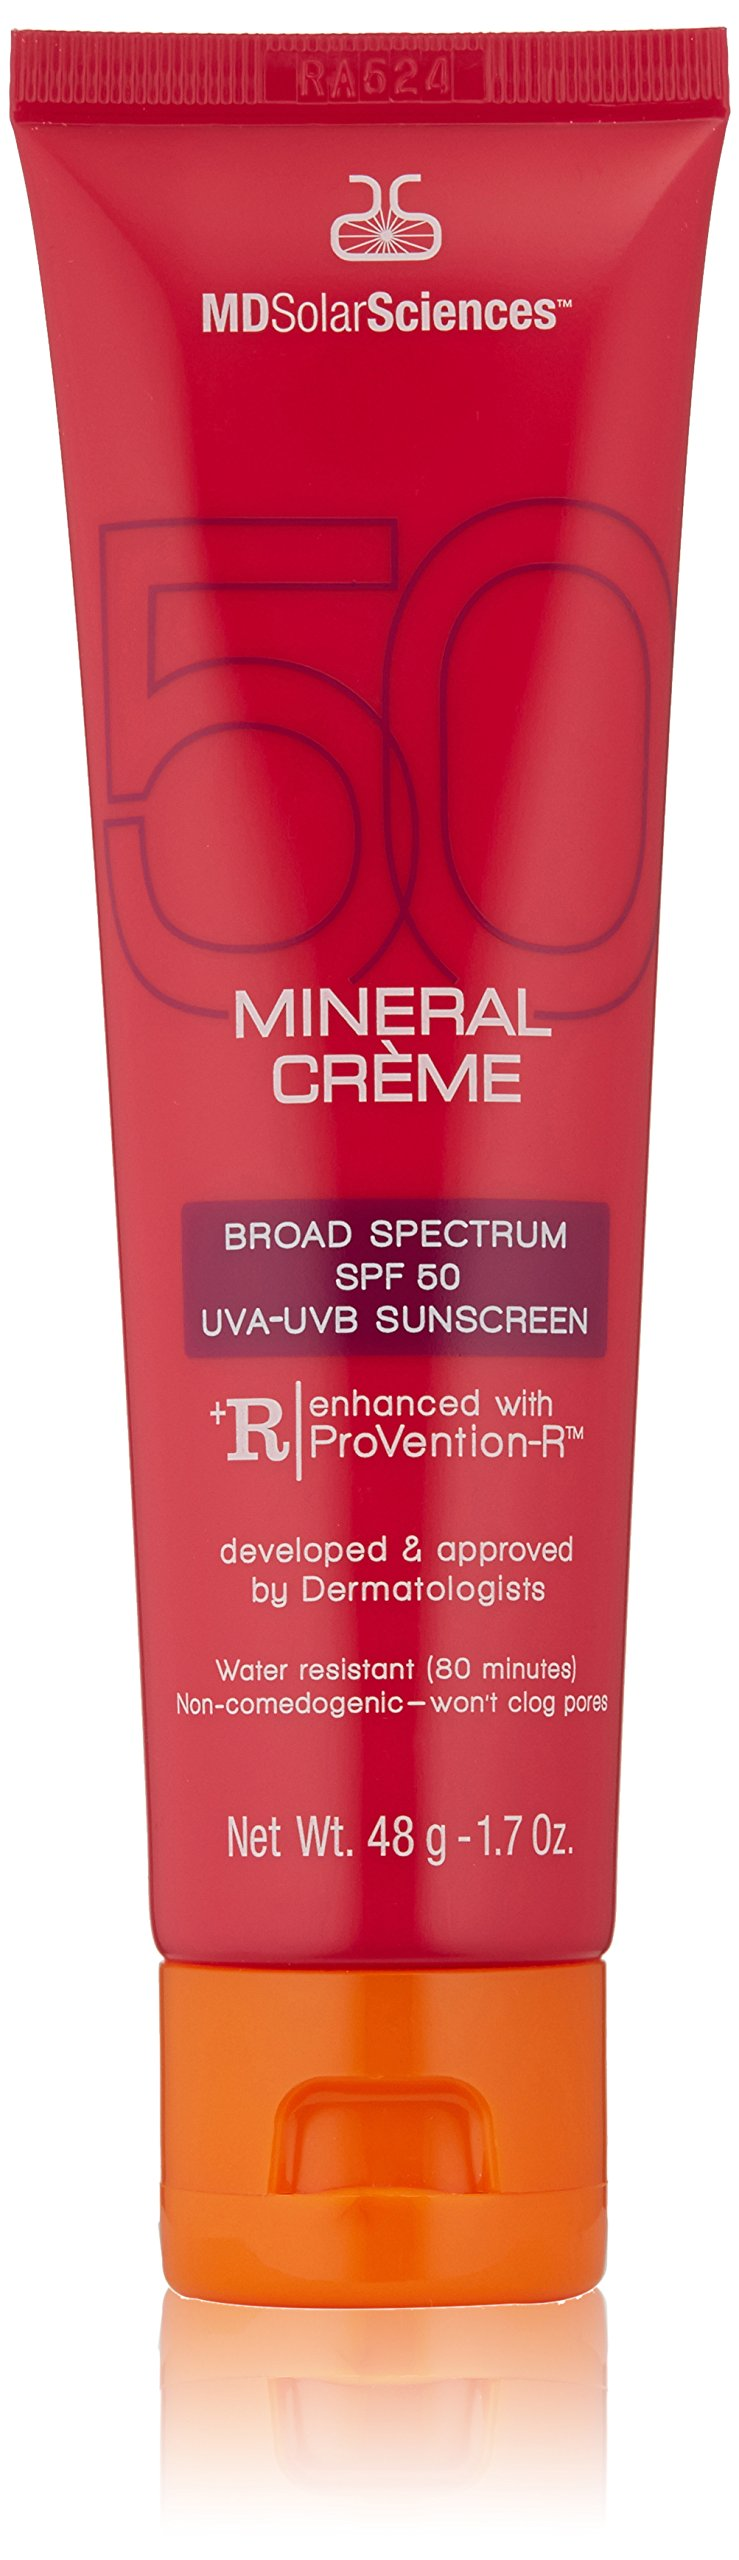 MDSolarSciences Mineral Crème Broad Spectrum SPF 50 Sunscreen